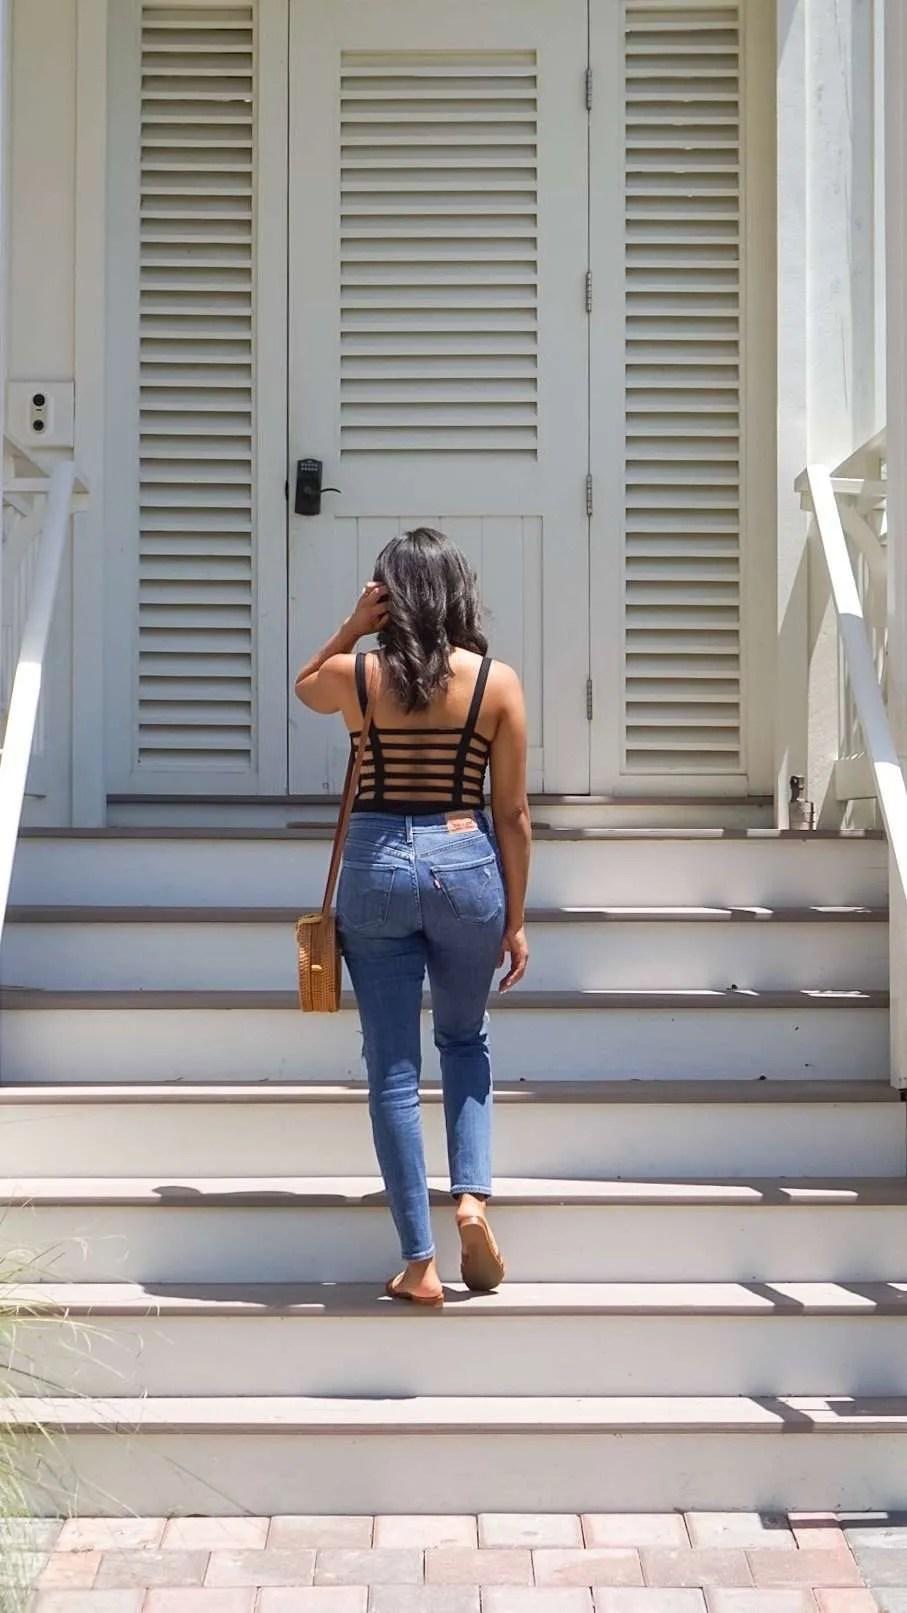 Trendy Thursday LinkUp: Bodysuits + Jeans